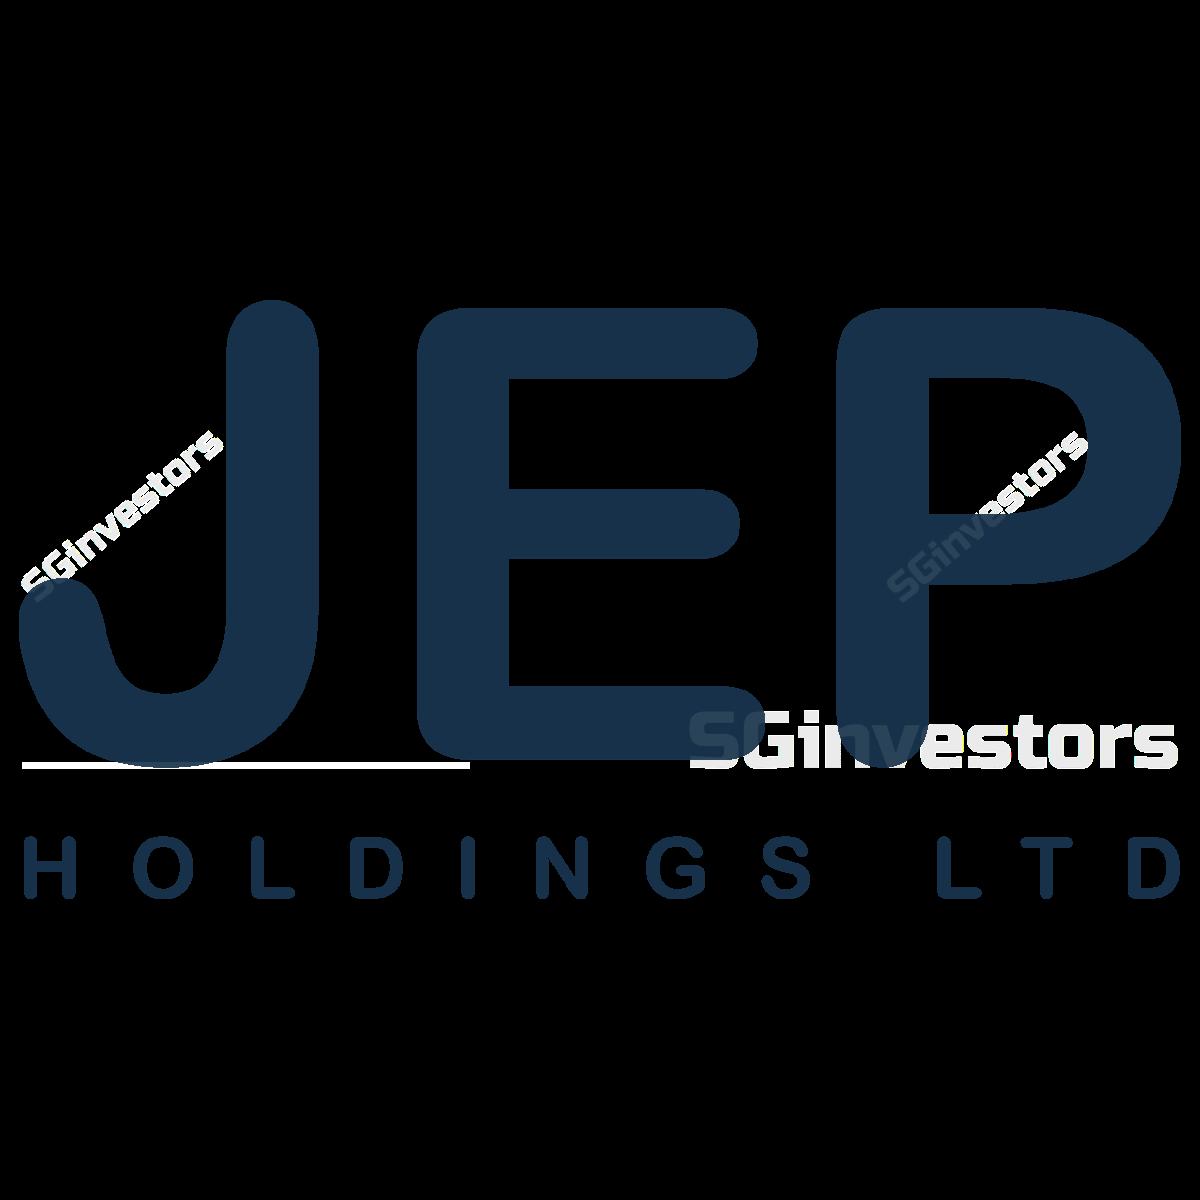 JEP HOLDINGS LTD. (SGX:1J4) | SGinvestors.io